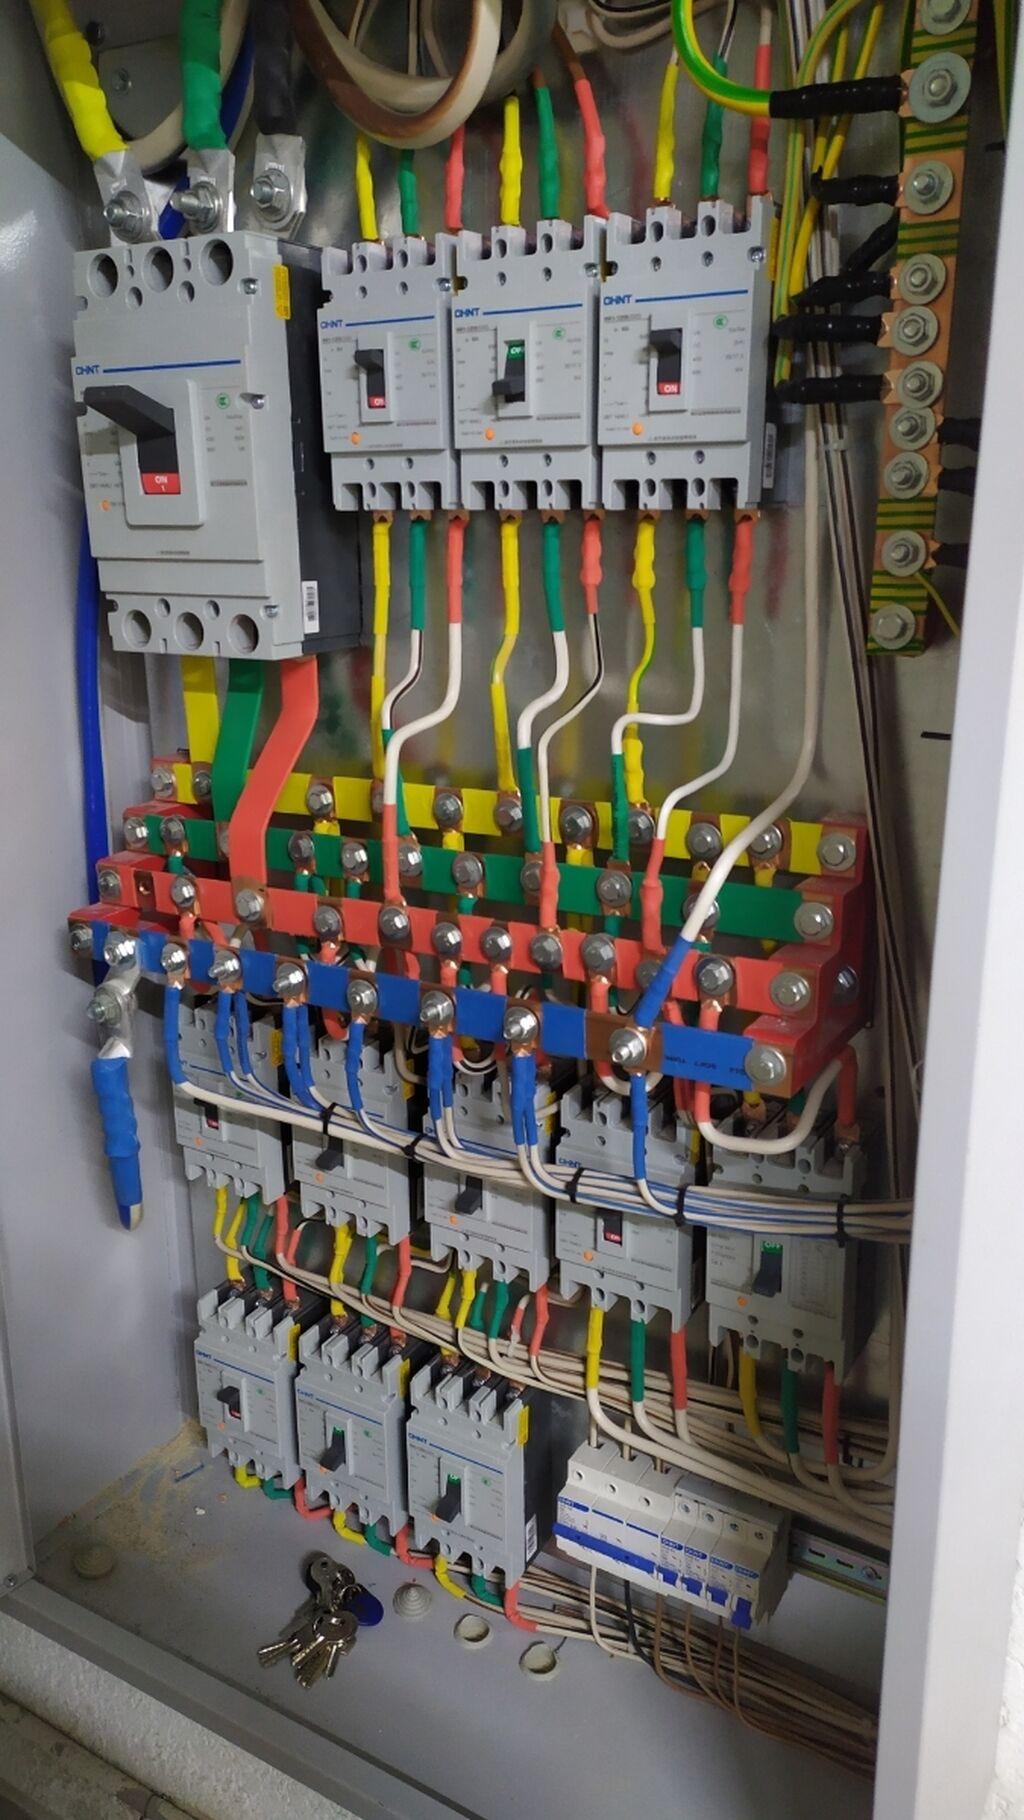 Электрик | Прокладка, замена кабеля | Стаж 3-5 лет опыта: Электрик | Прокладка, замена кабеля | Стаж 3-5 лет опыта